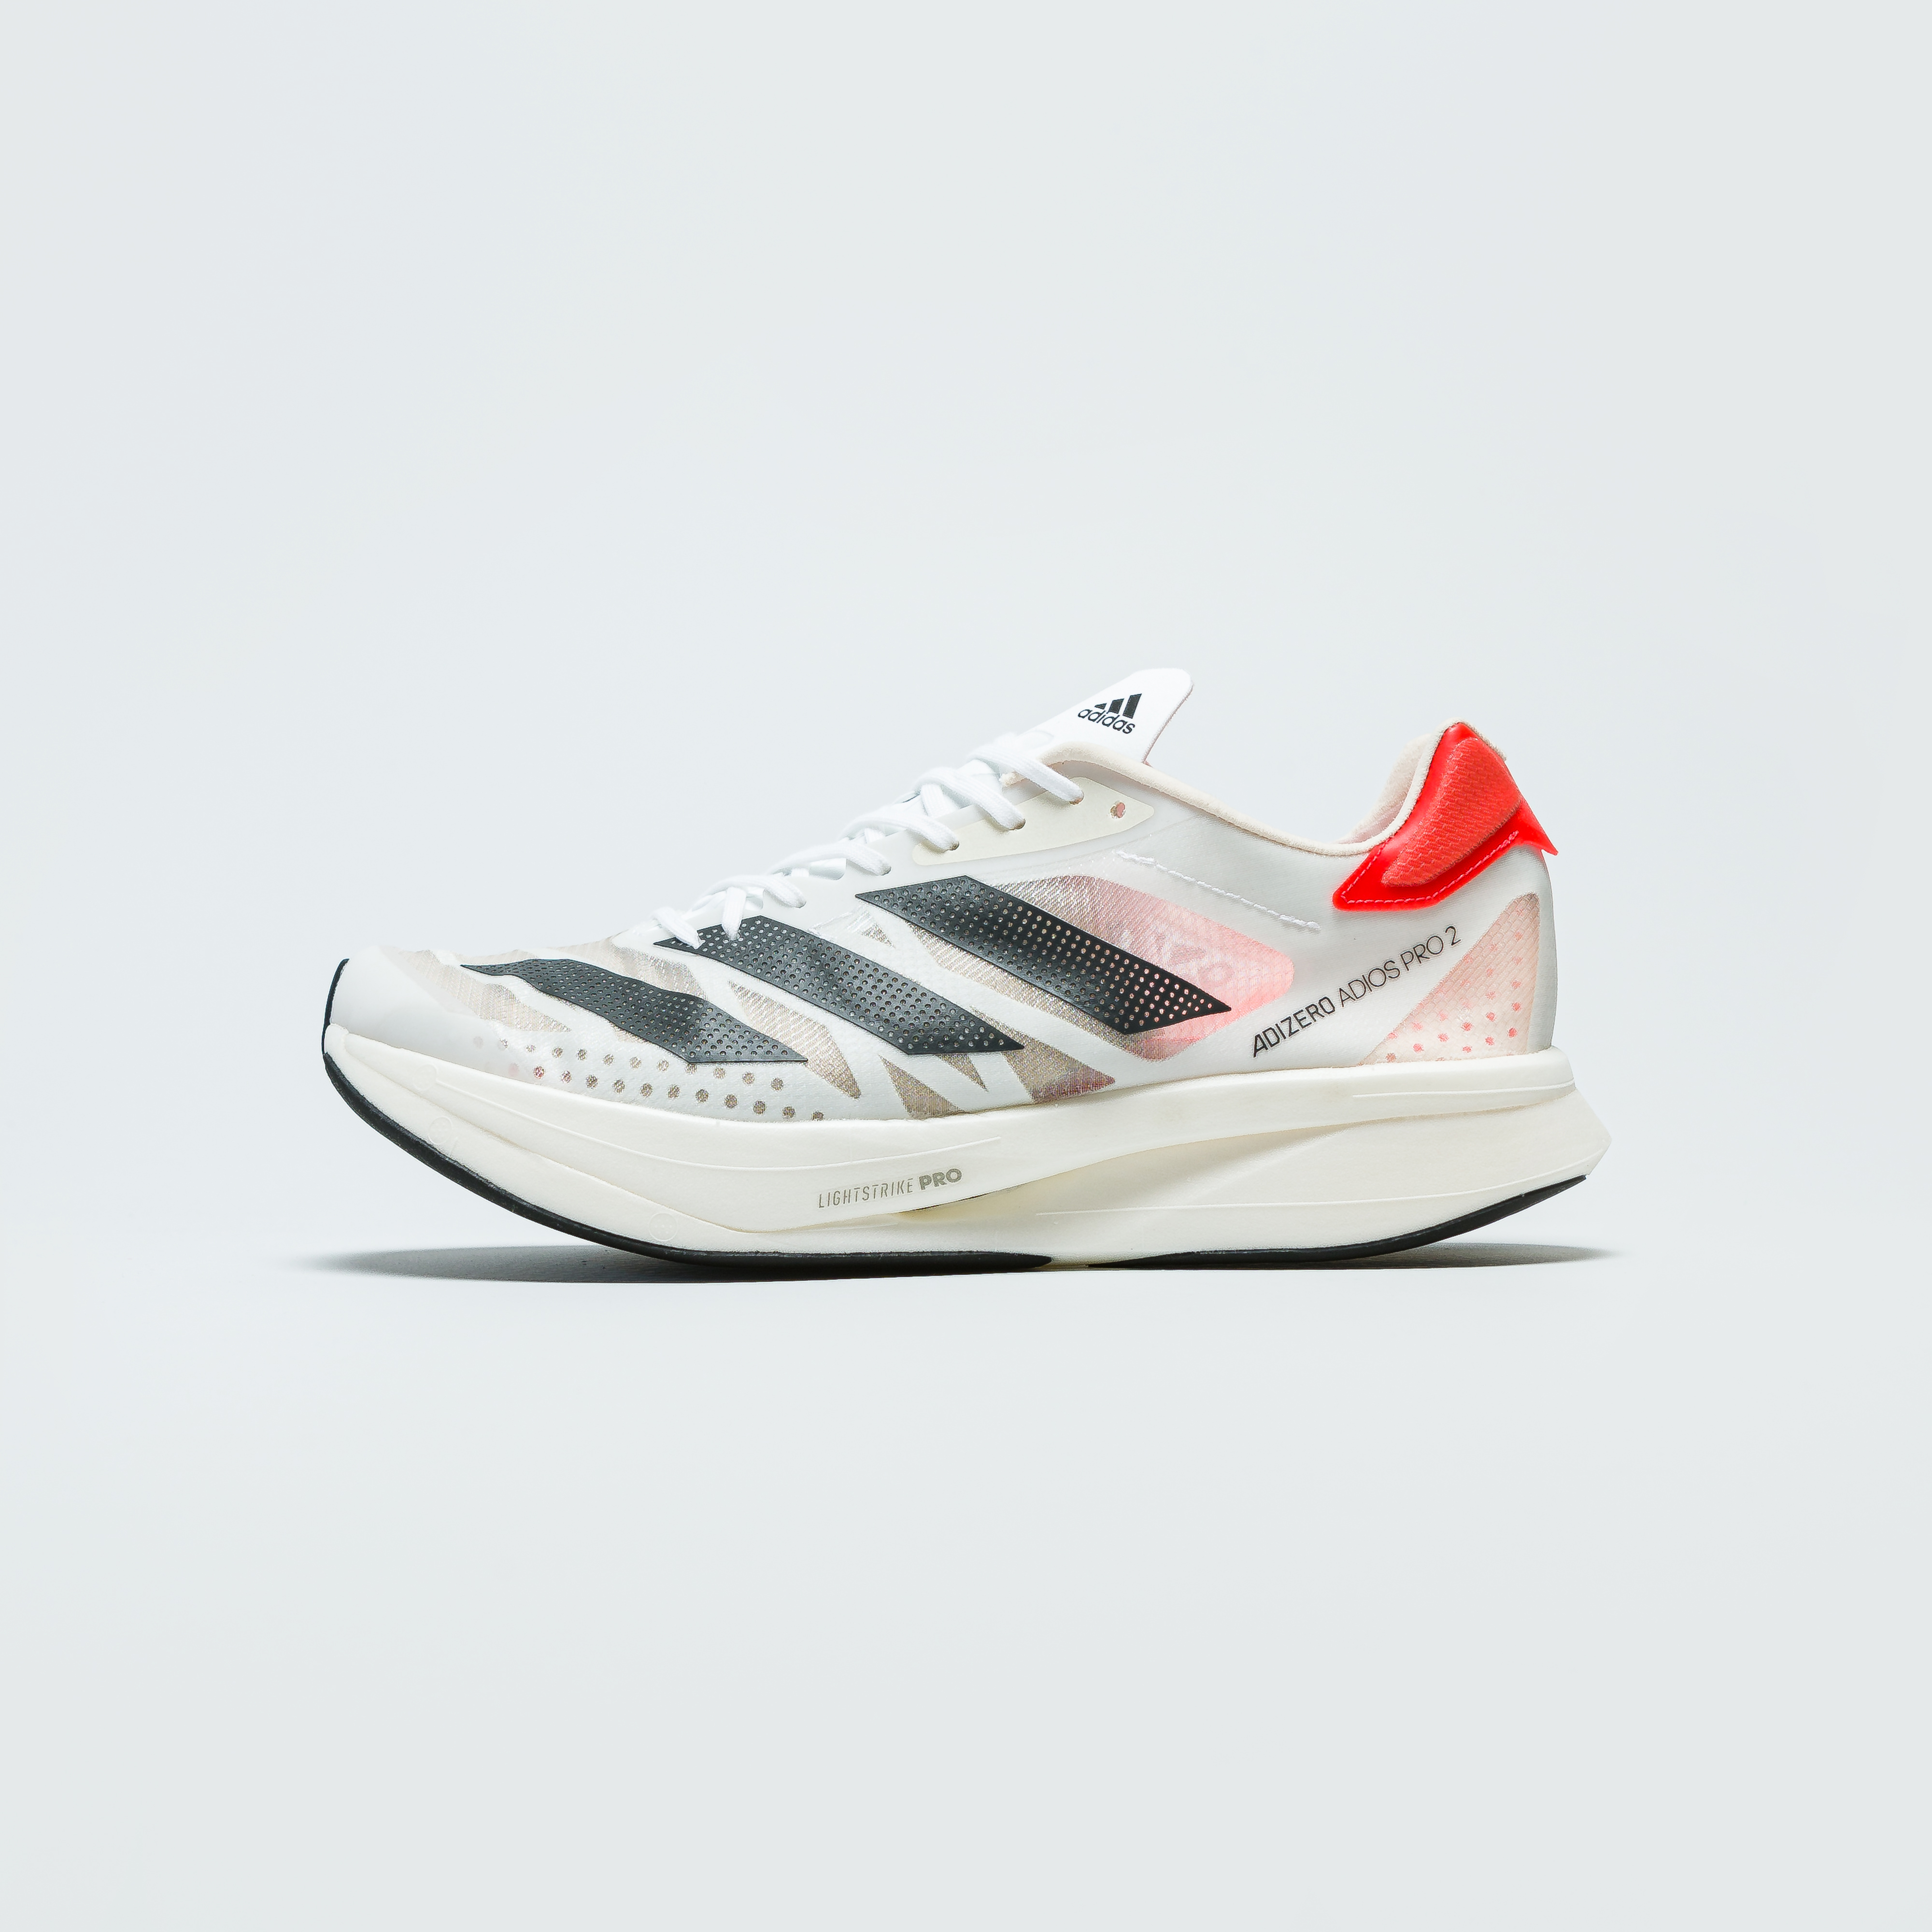 News— adidas Adizero Adios Pro 2